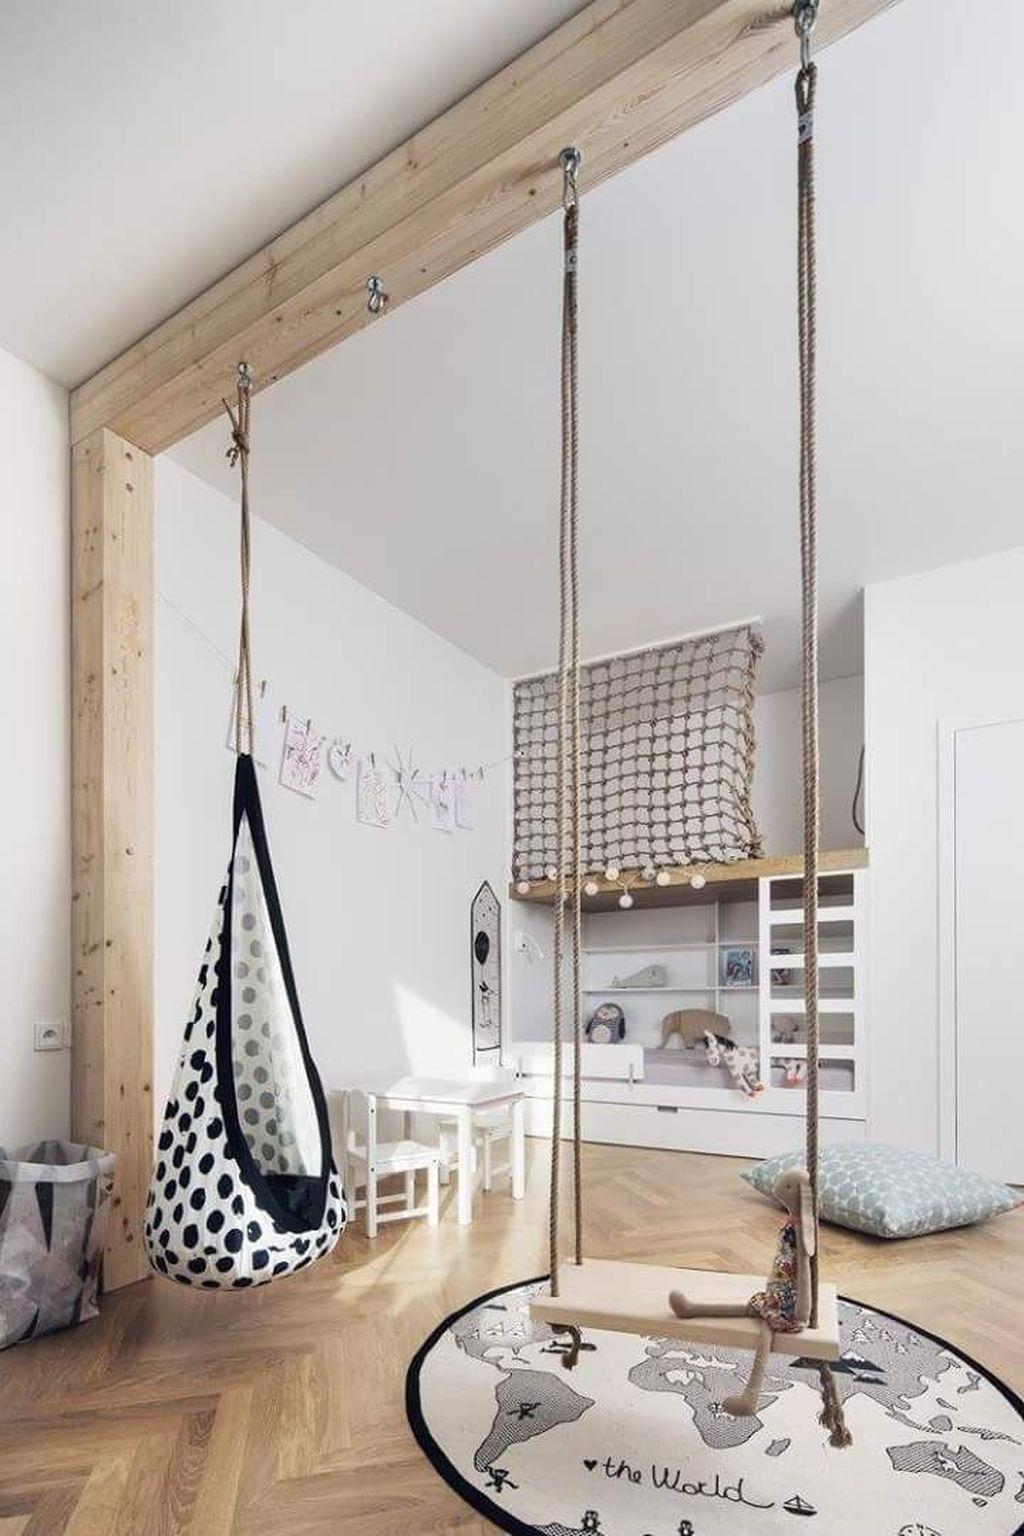 50 Inspiring Kids Room Design Ideas images